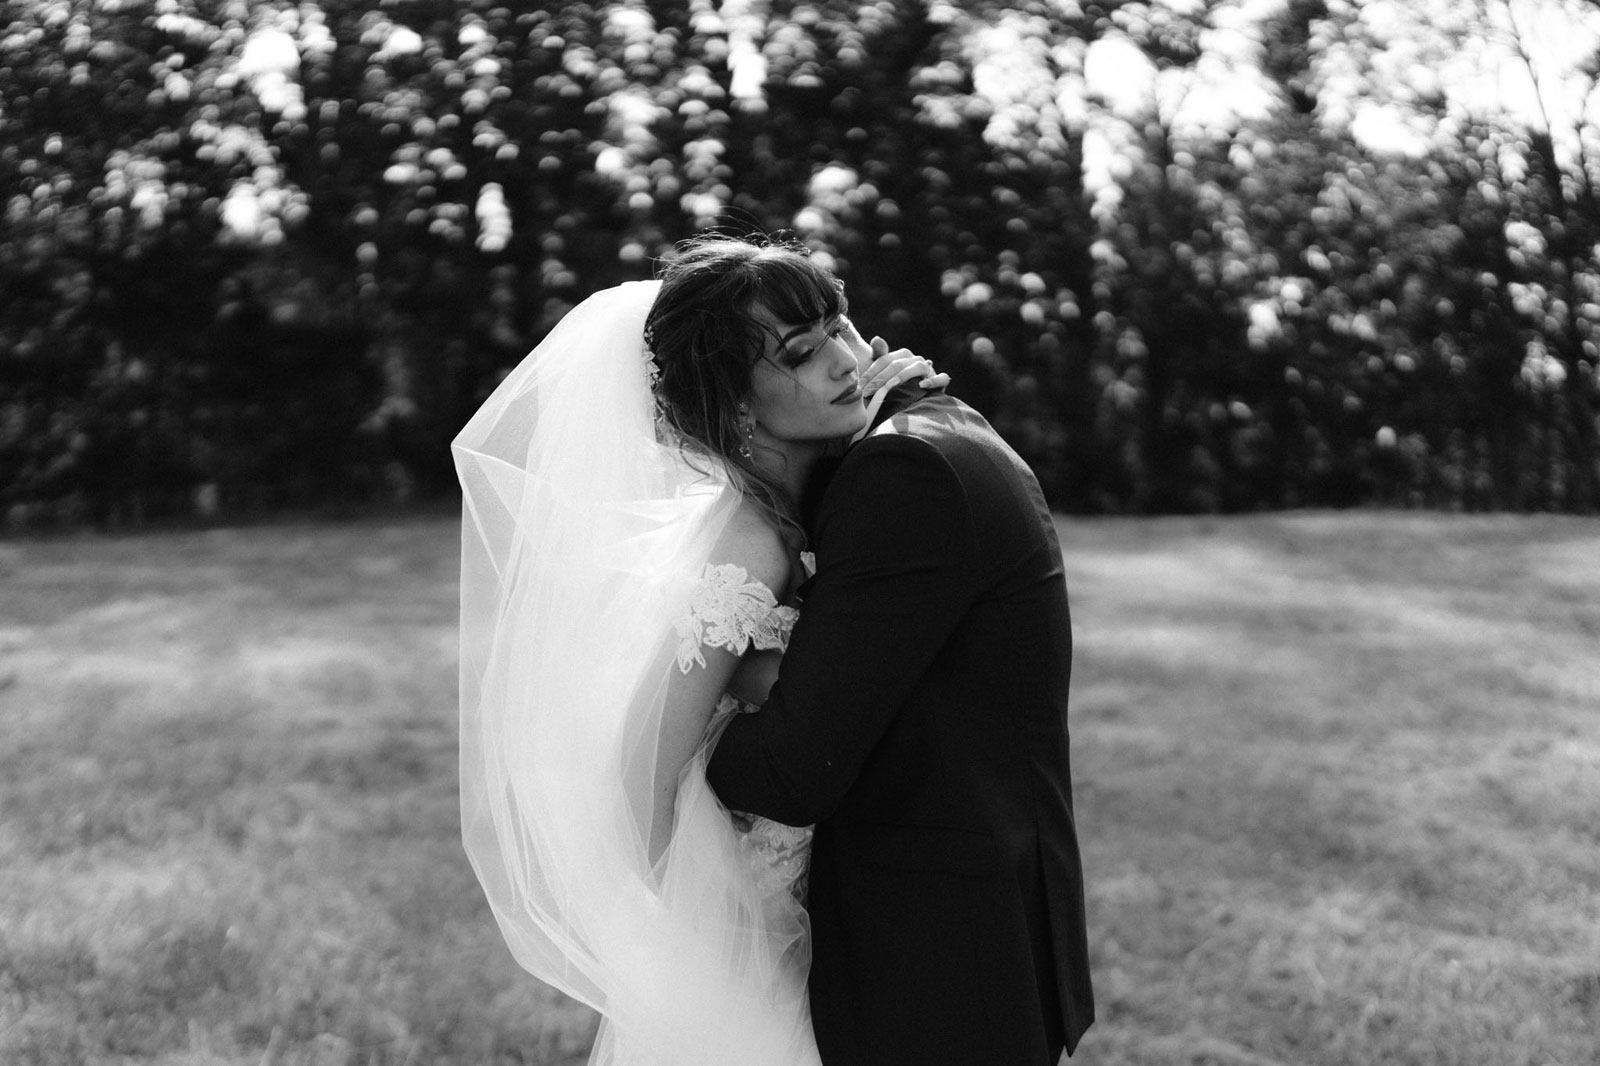 newfound-n-c-olive-tree-cottage-tauranga-wedding-photographer-854A